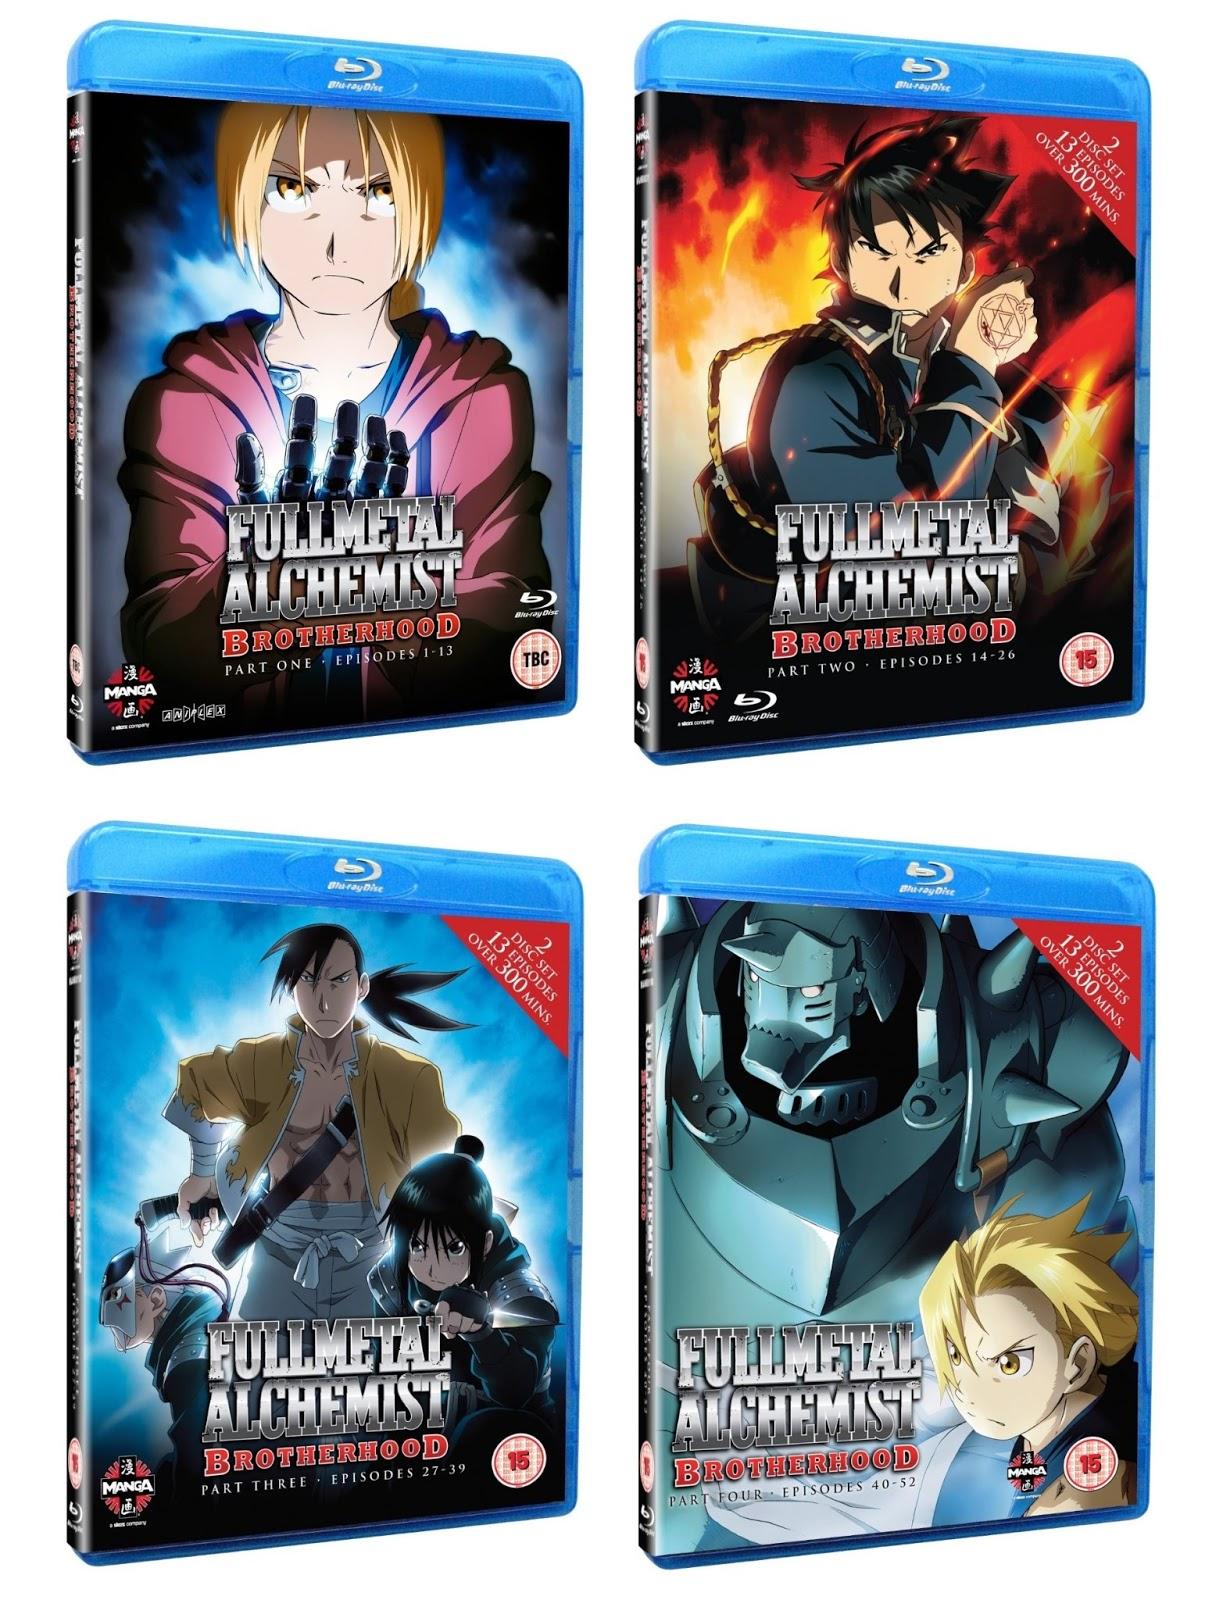 Aesthetica Of A Rogue Hero Ita anime on blu-ray!: fullmetal alchemist brotherhood - part